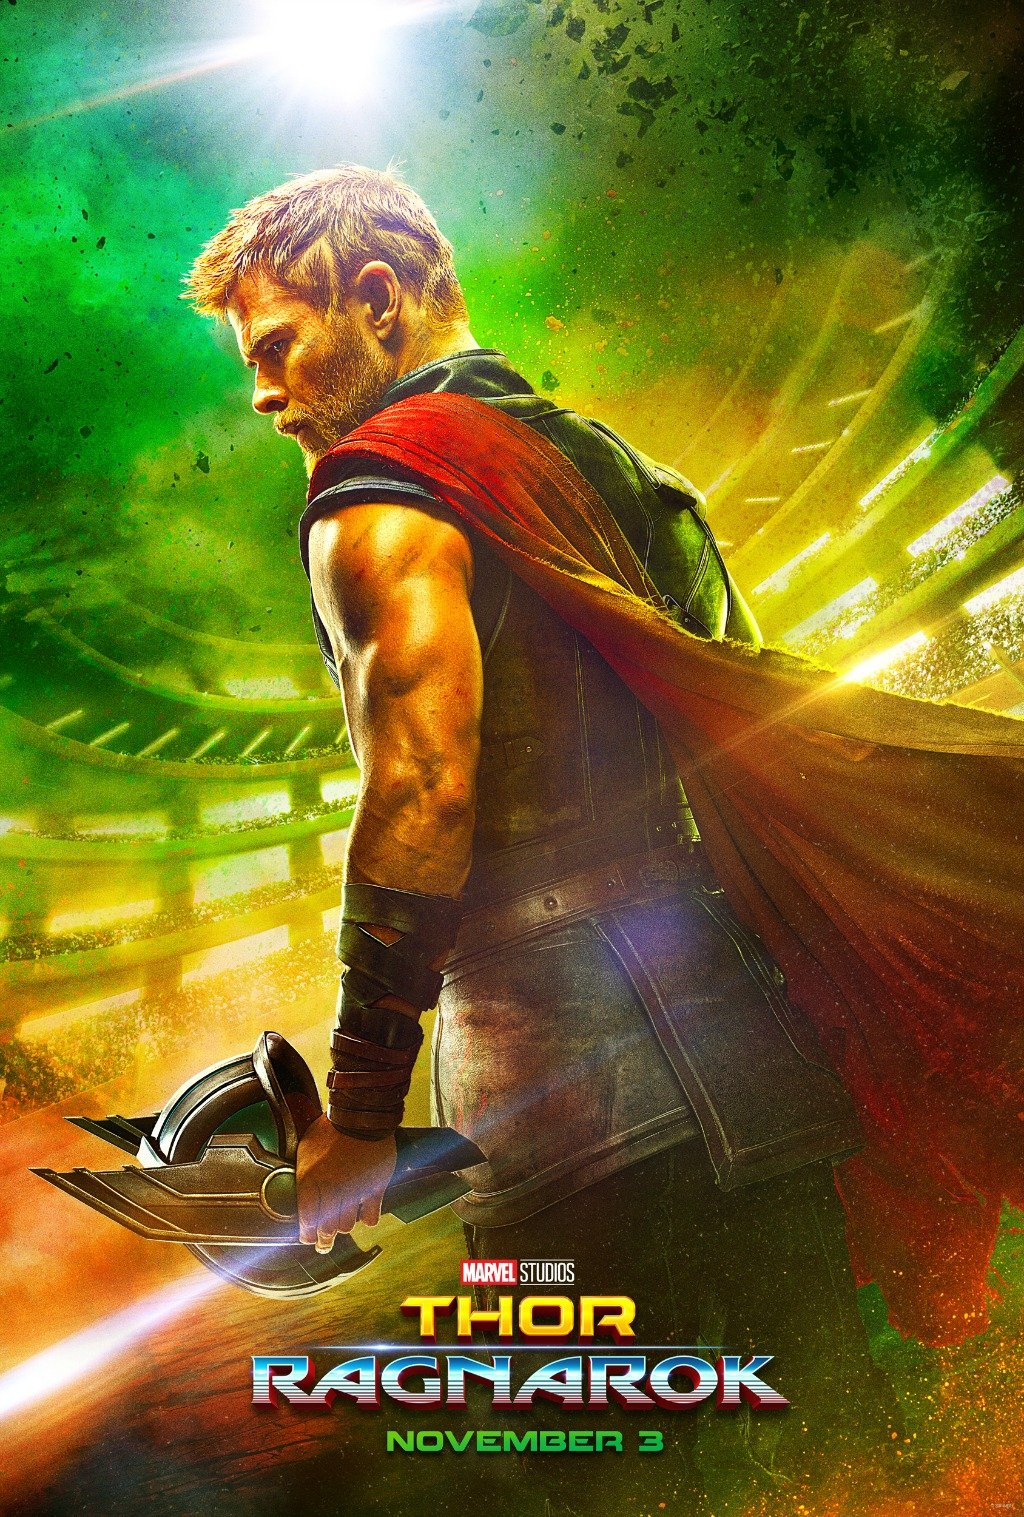 Marvel Studios' Thor: Ragnarok Teaser Trailer